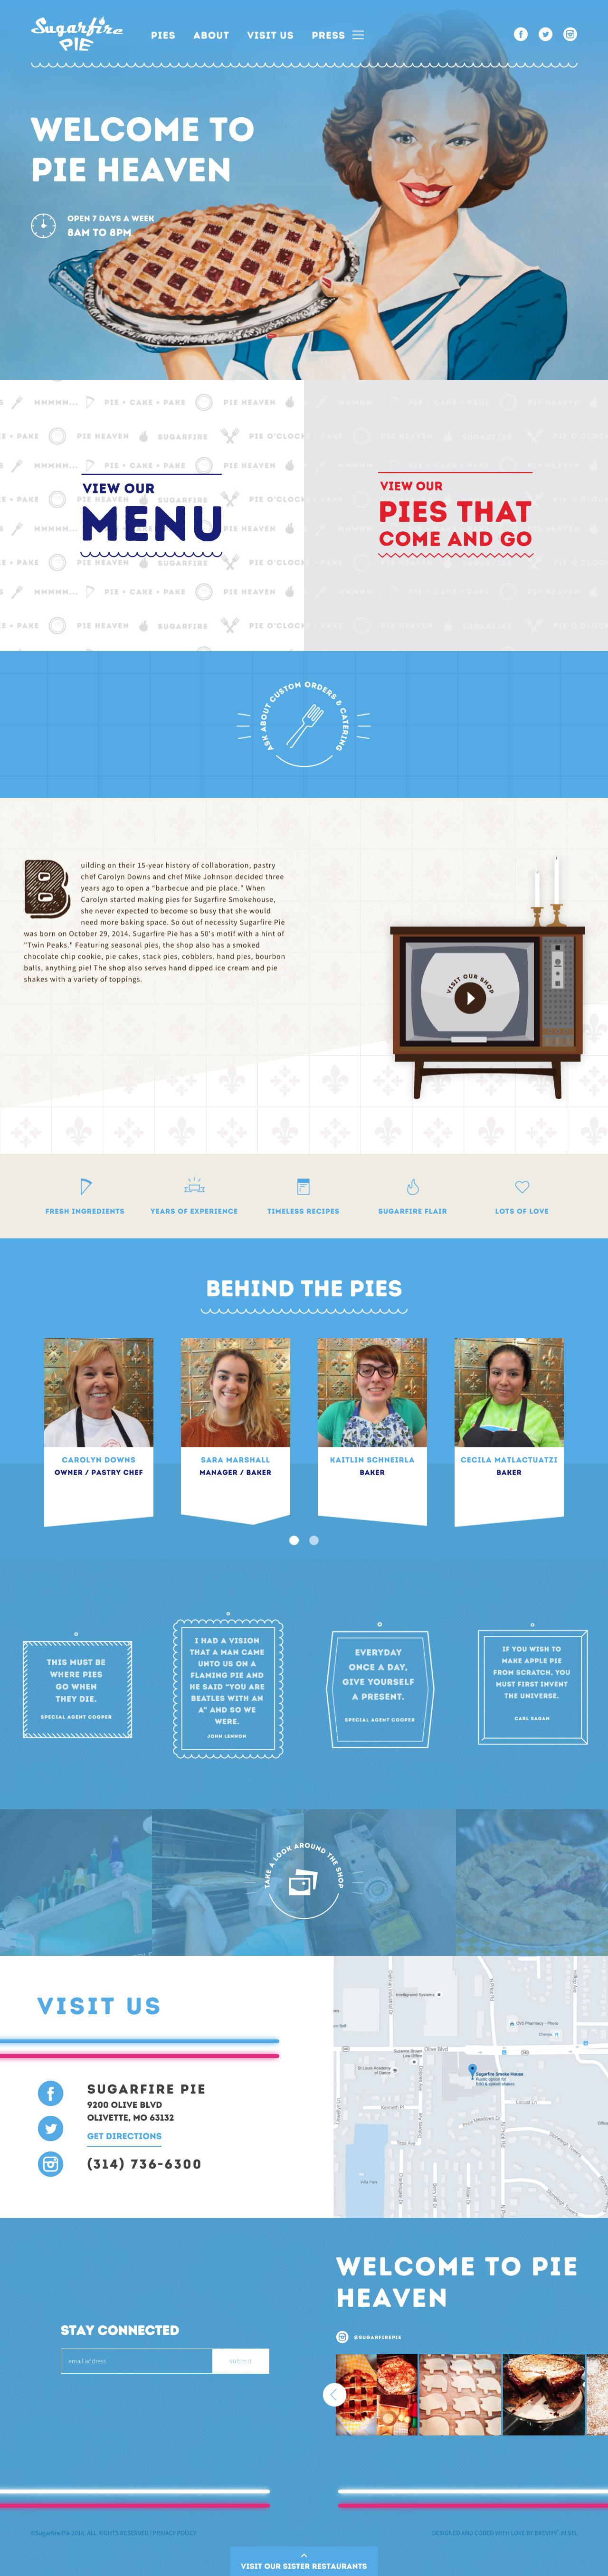 Sugarfire Pie Website Screenshot